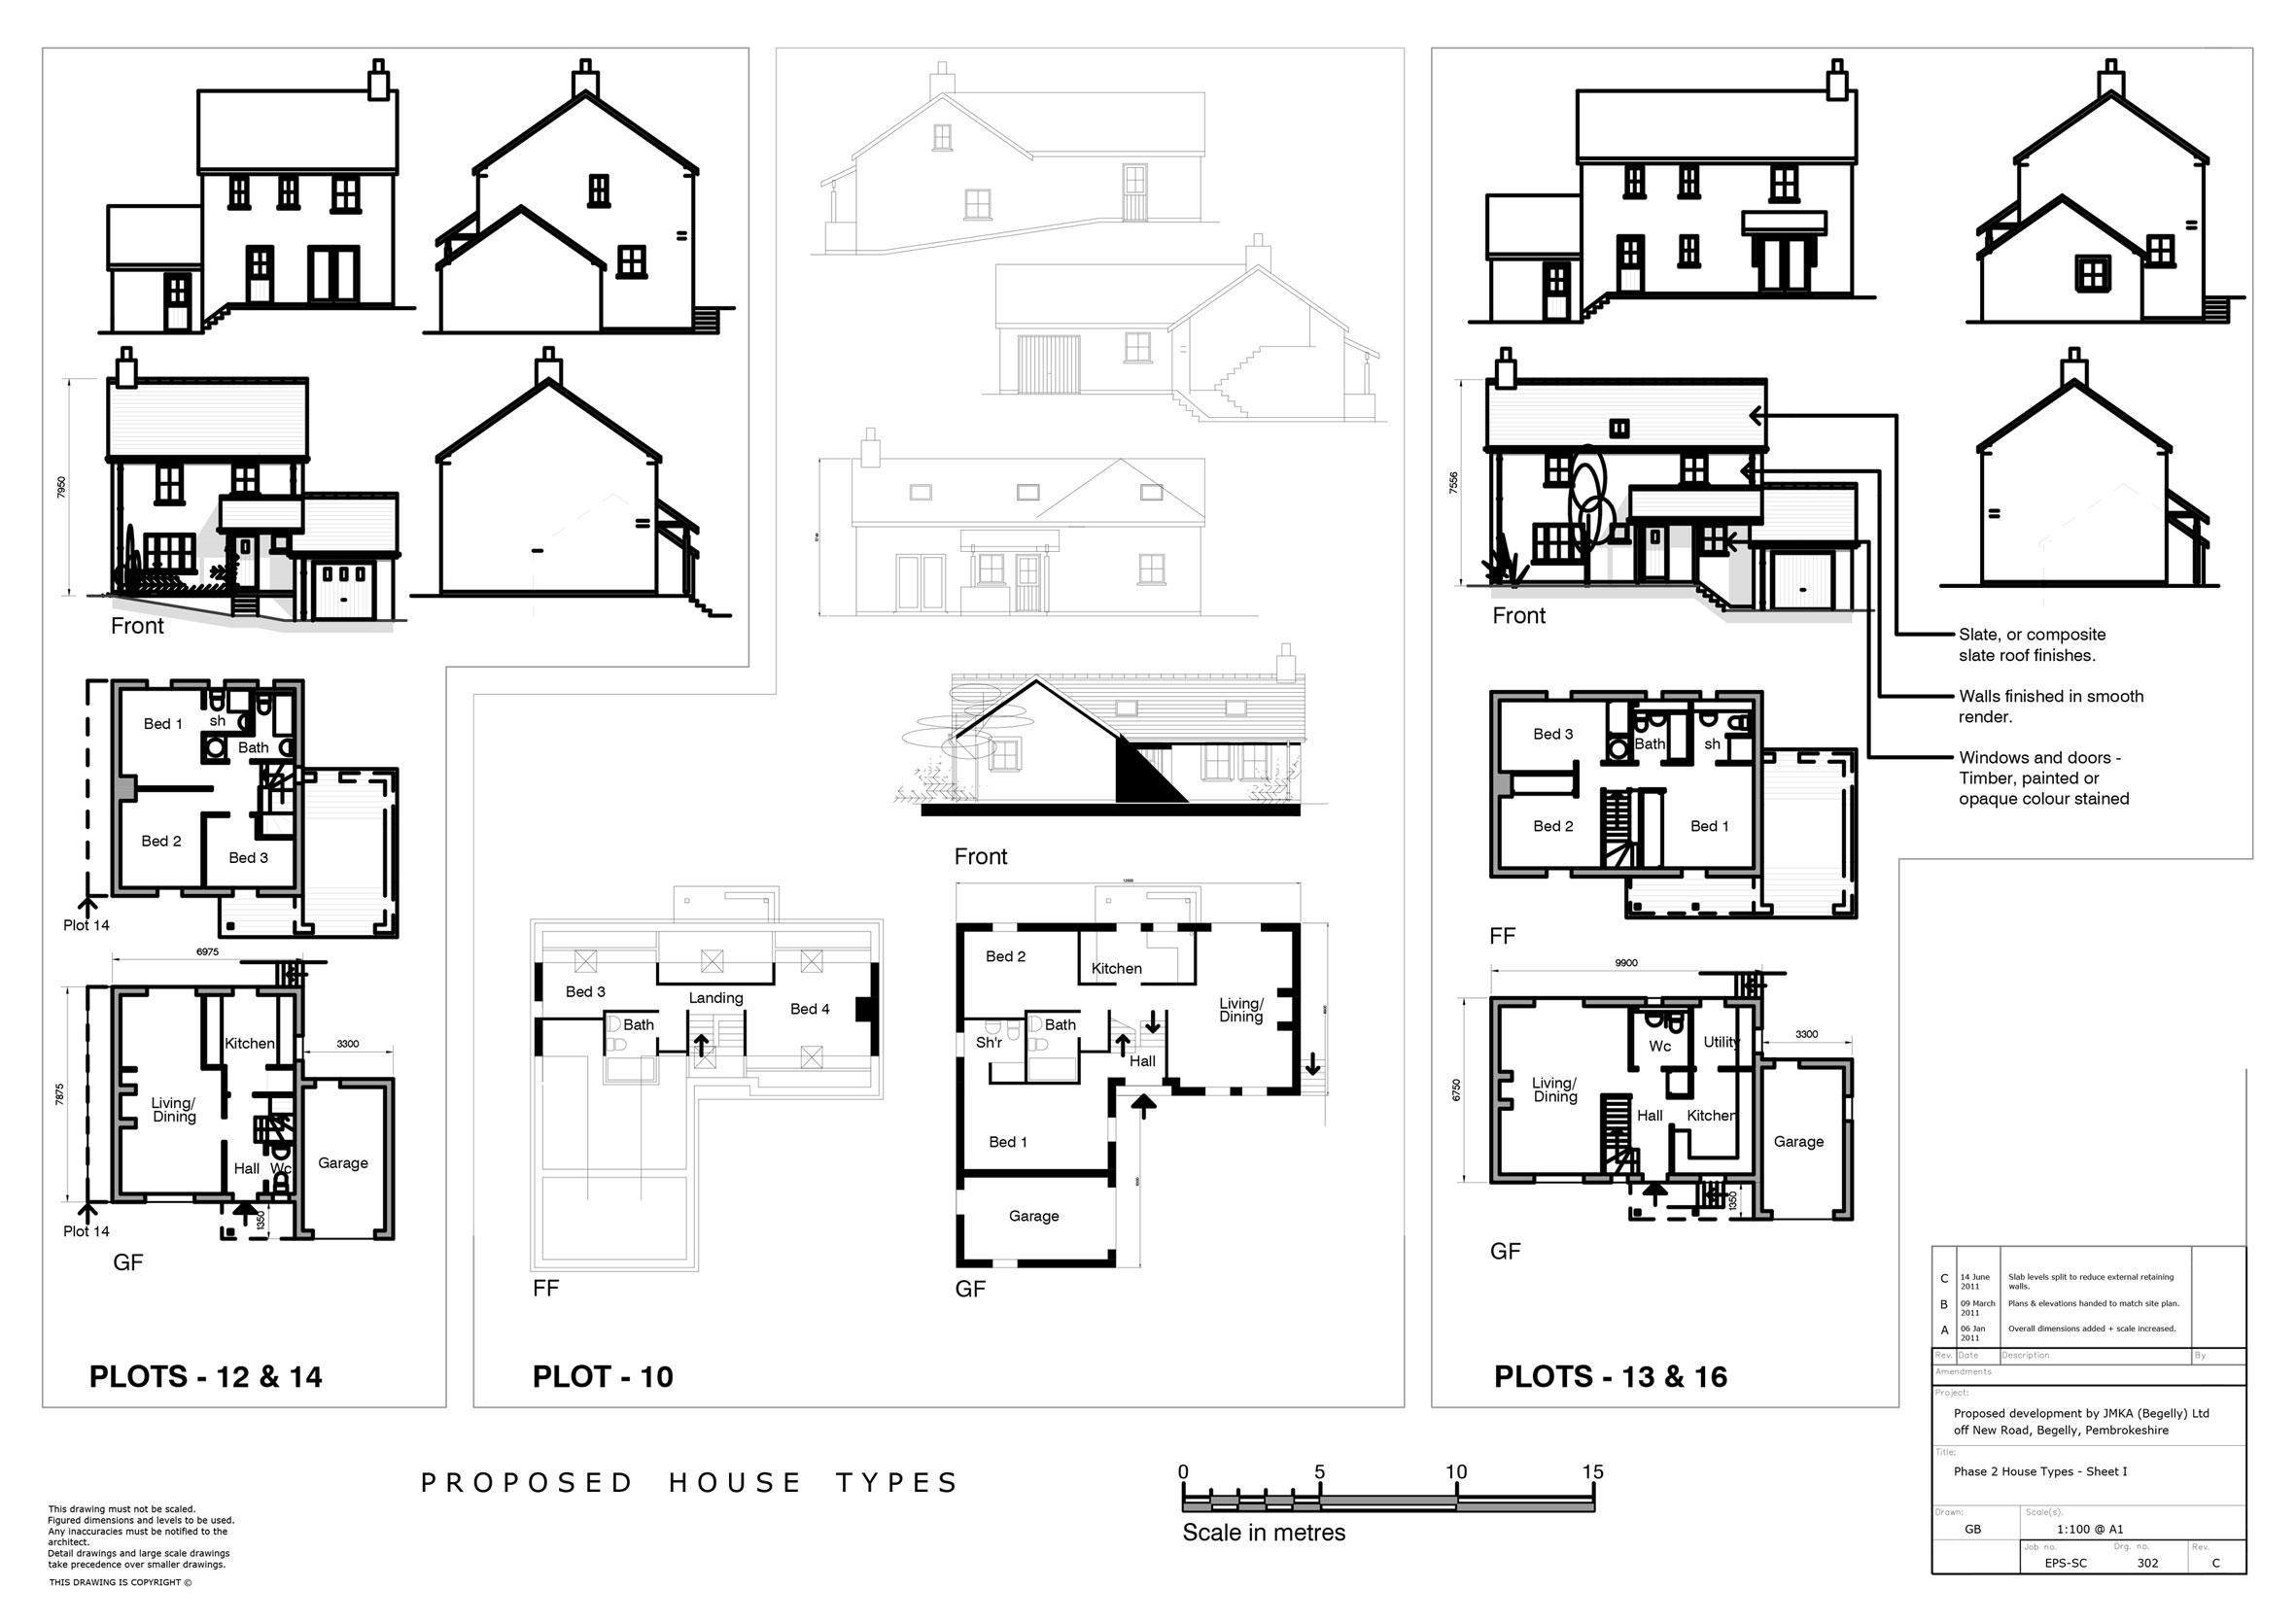 Pembrokeshire-Living-Self-Build-Plots-House-Types-01-B